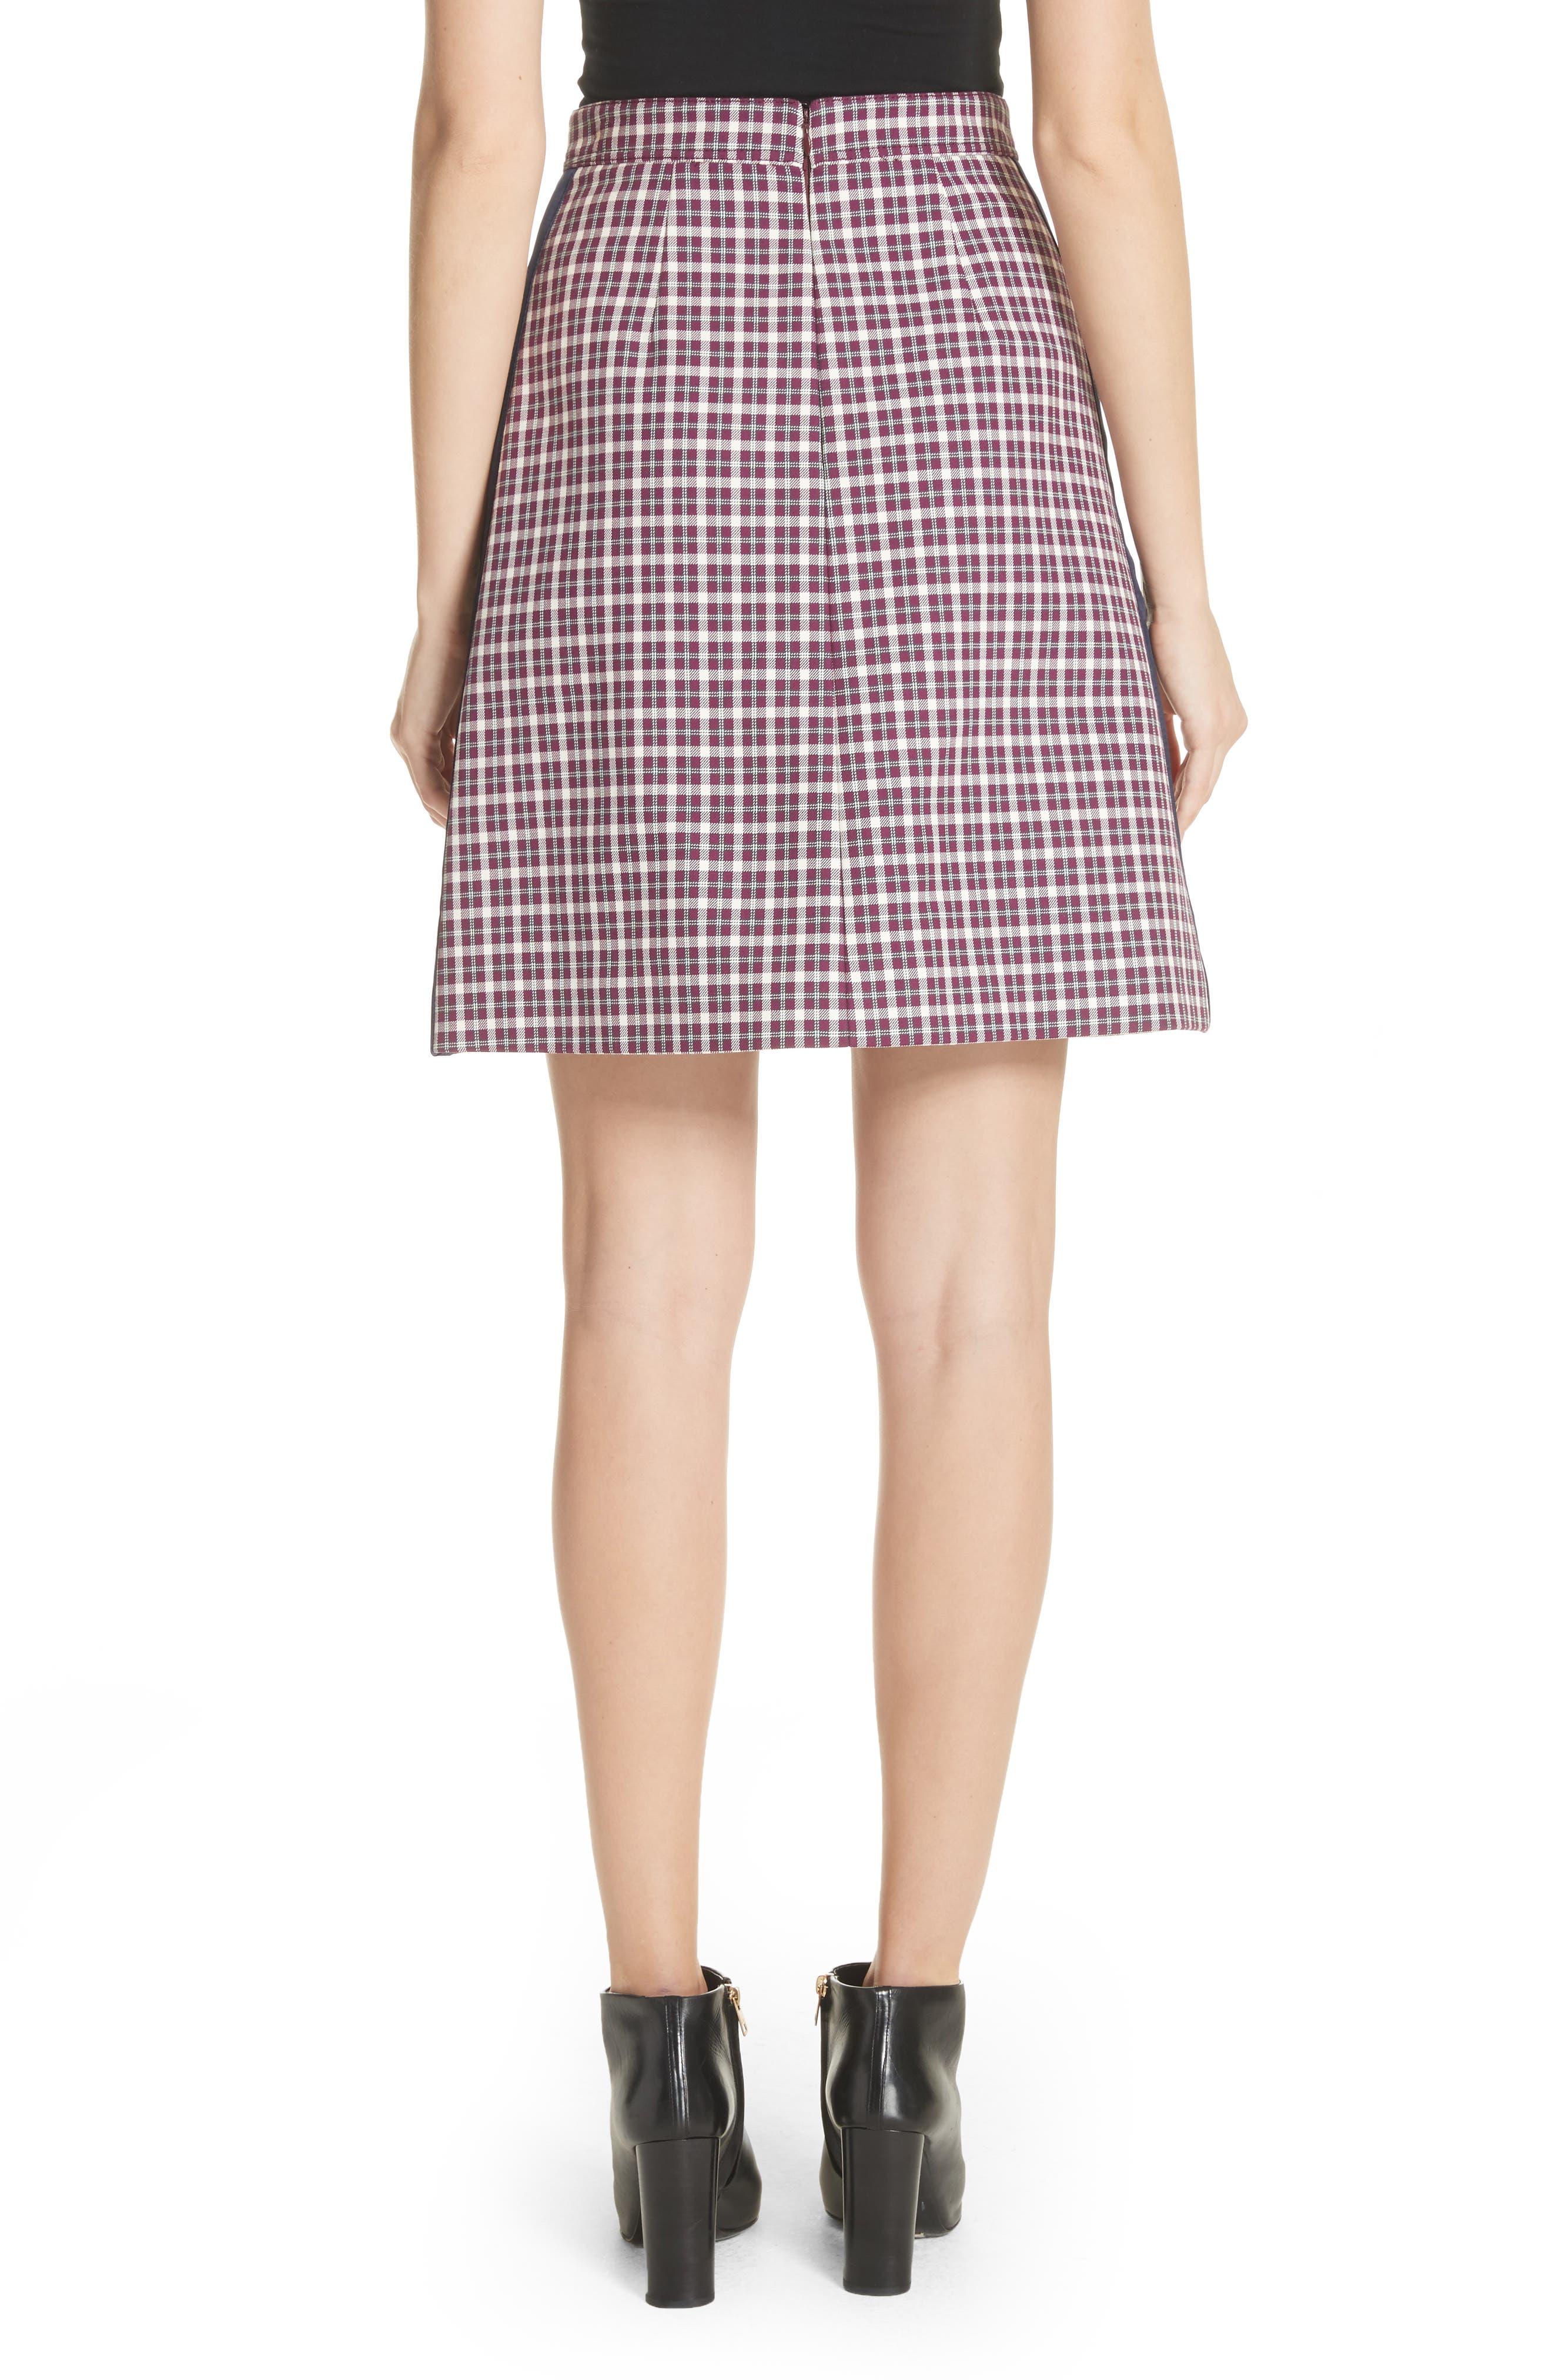 Stanforth Plaid A-Line Skirt,                             Alternate thumbnail 2, color,                             931